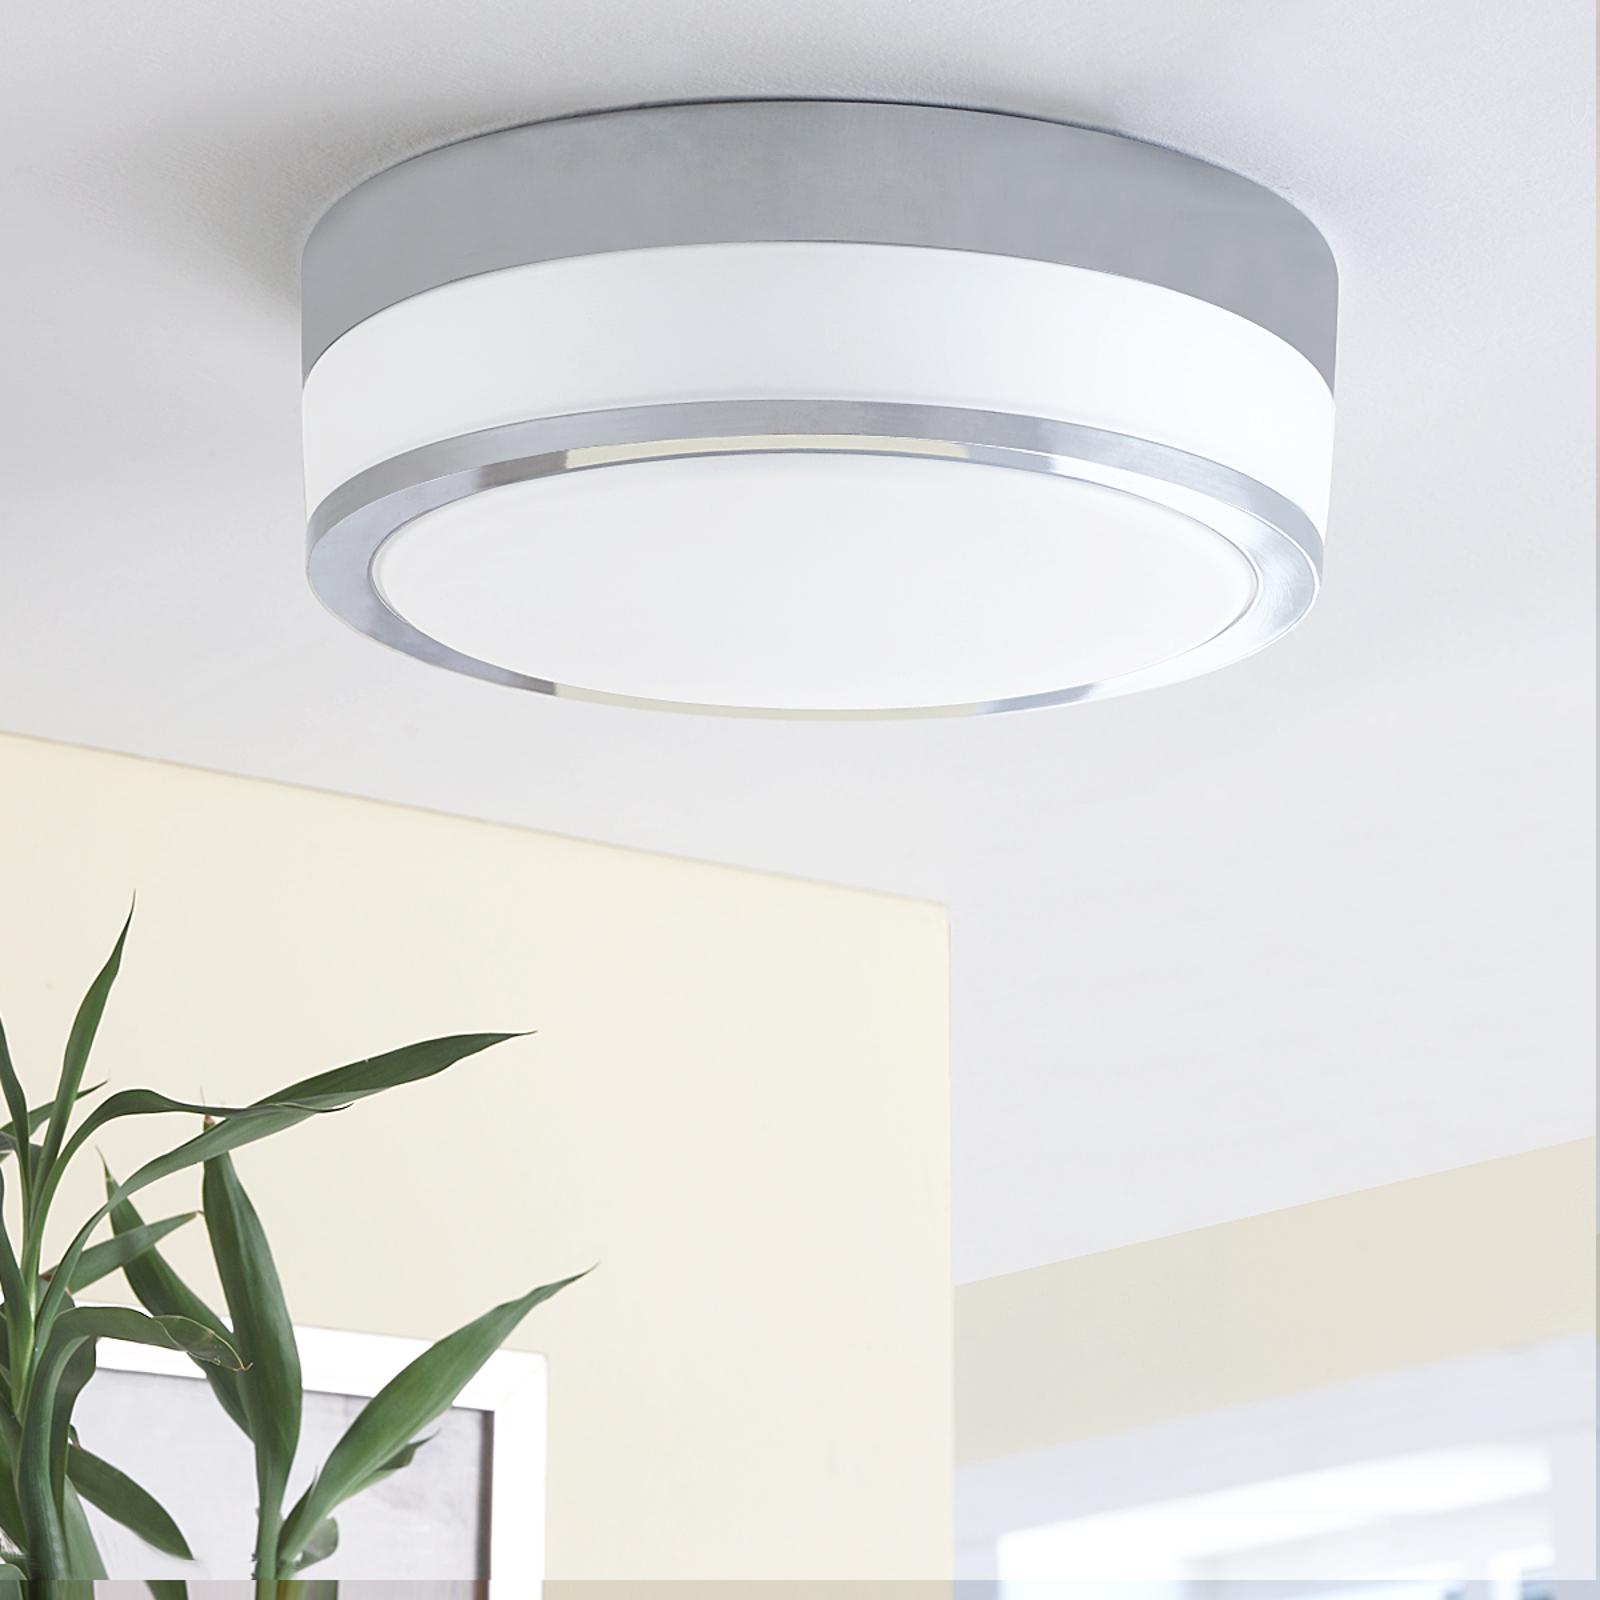 Lindby Flavi LED-Bad-Deckenlampe,  Ø 28 cm, chrom